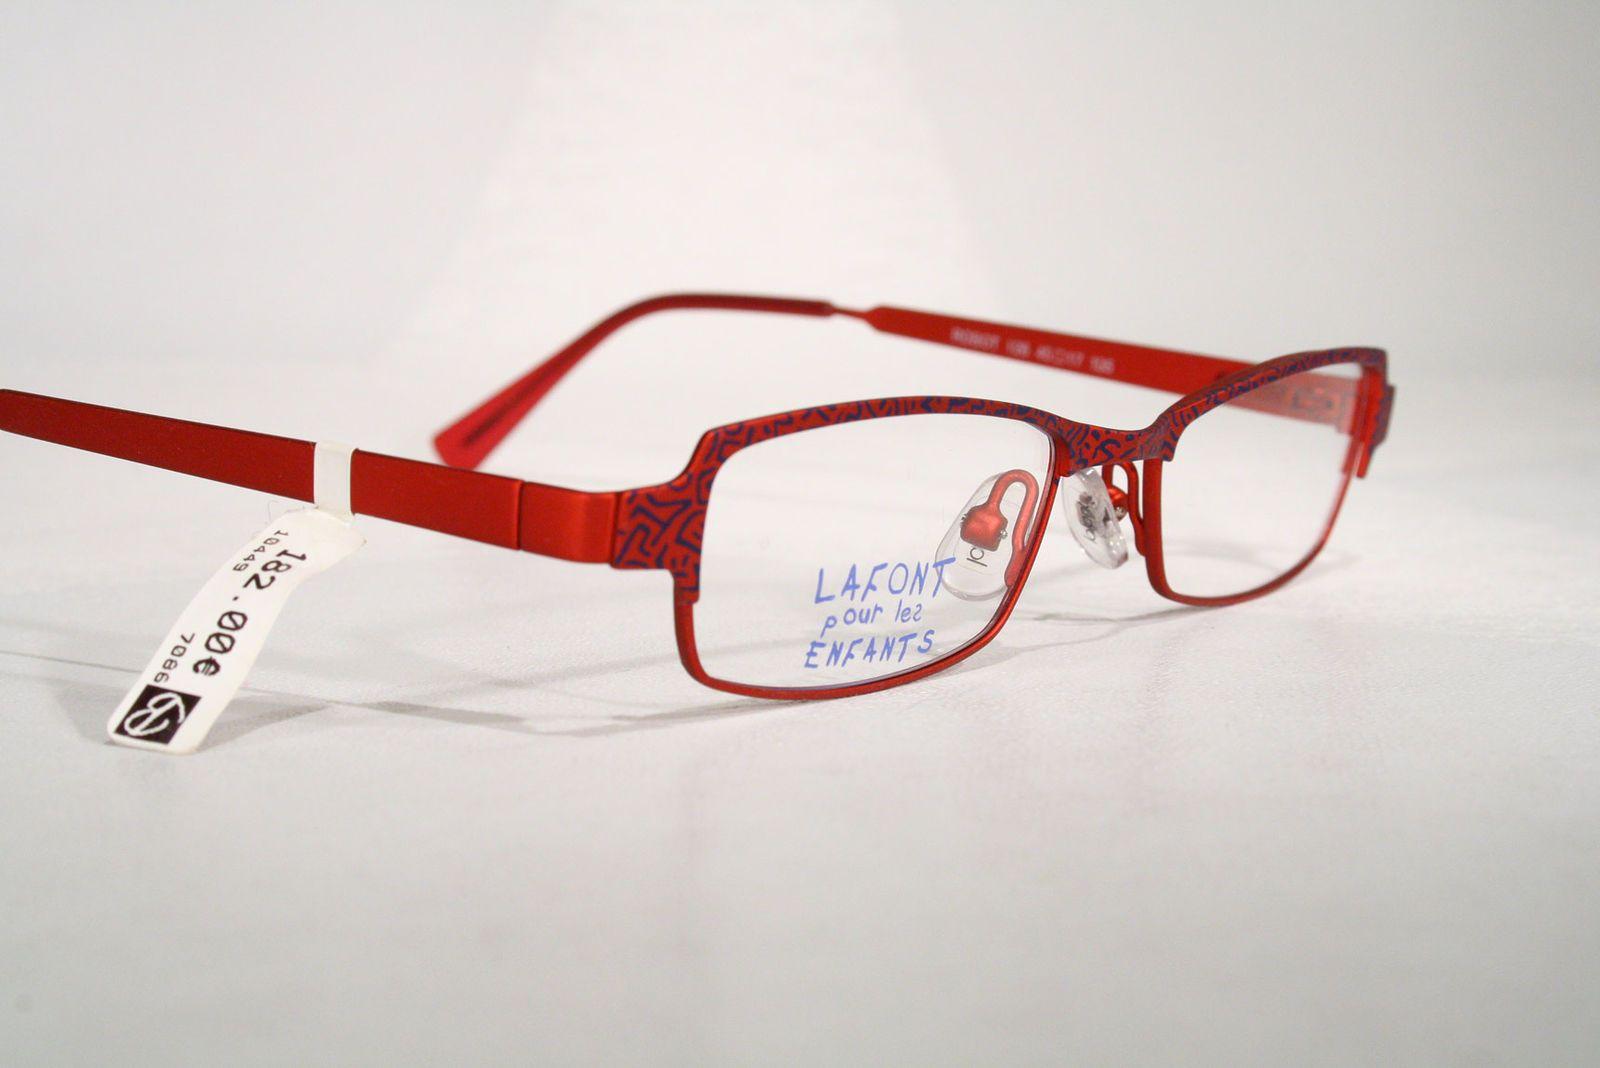 f680bb40405a Amazing JEAN LAFONT Pour Les Enfants Children s  ROBOT  Eyeglass Frames  Glasses   eBay (RipVanW)